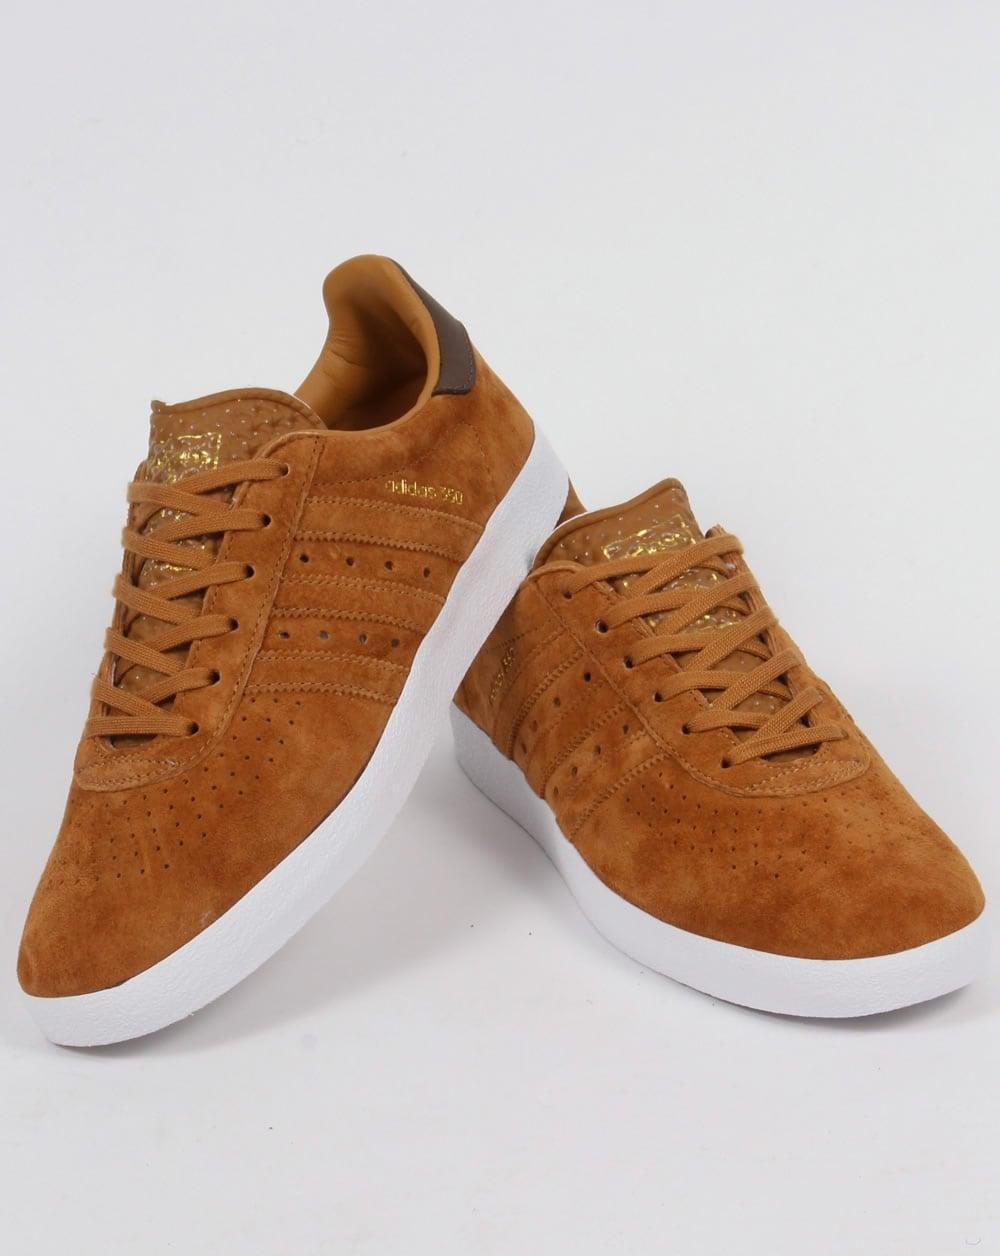 Adidas Trainers Adidas 350 Trainers Deep Tan / Brown